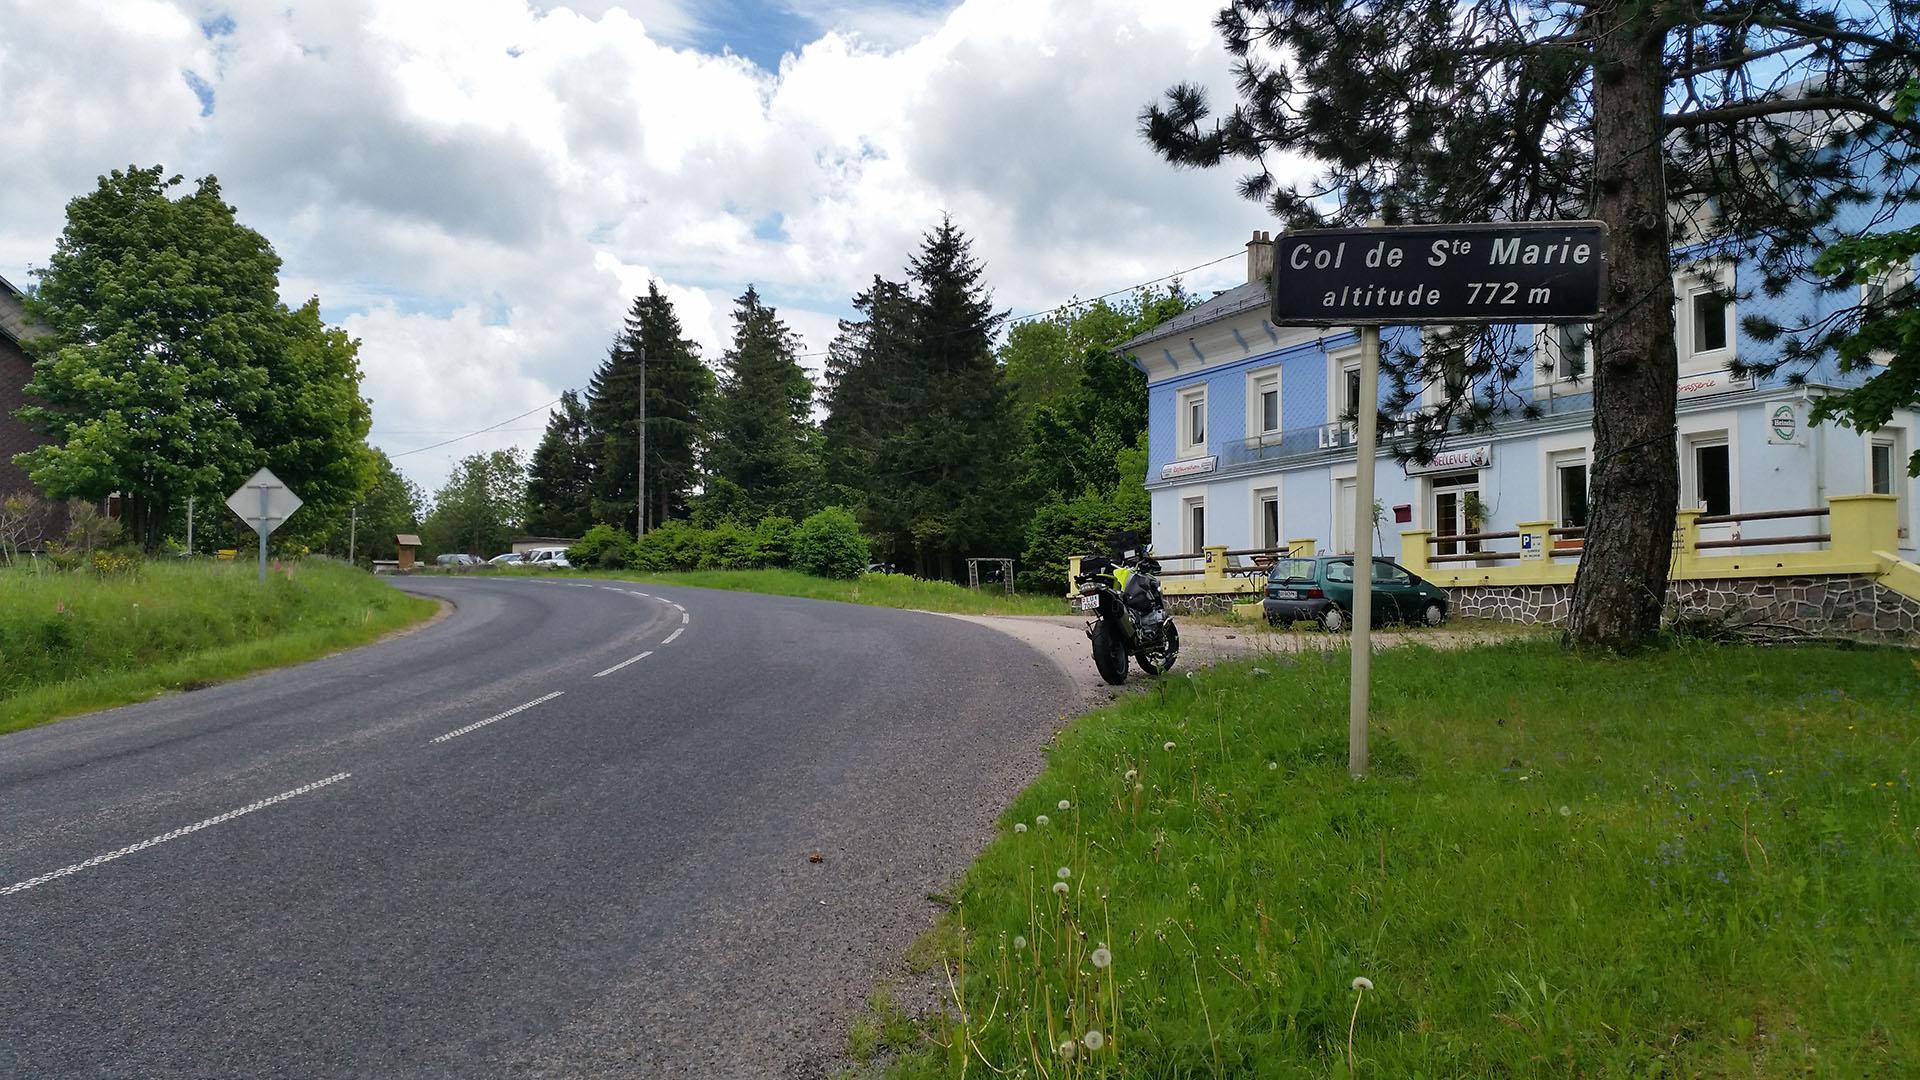 0772 - F - Col de Sainte-Marie